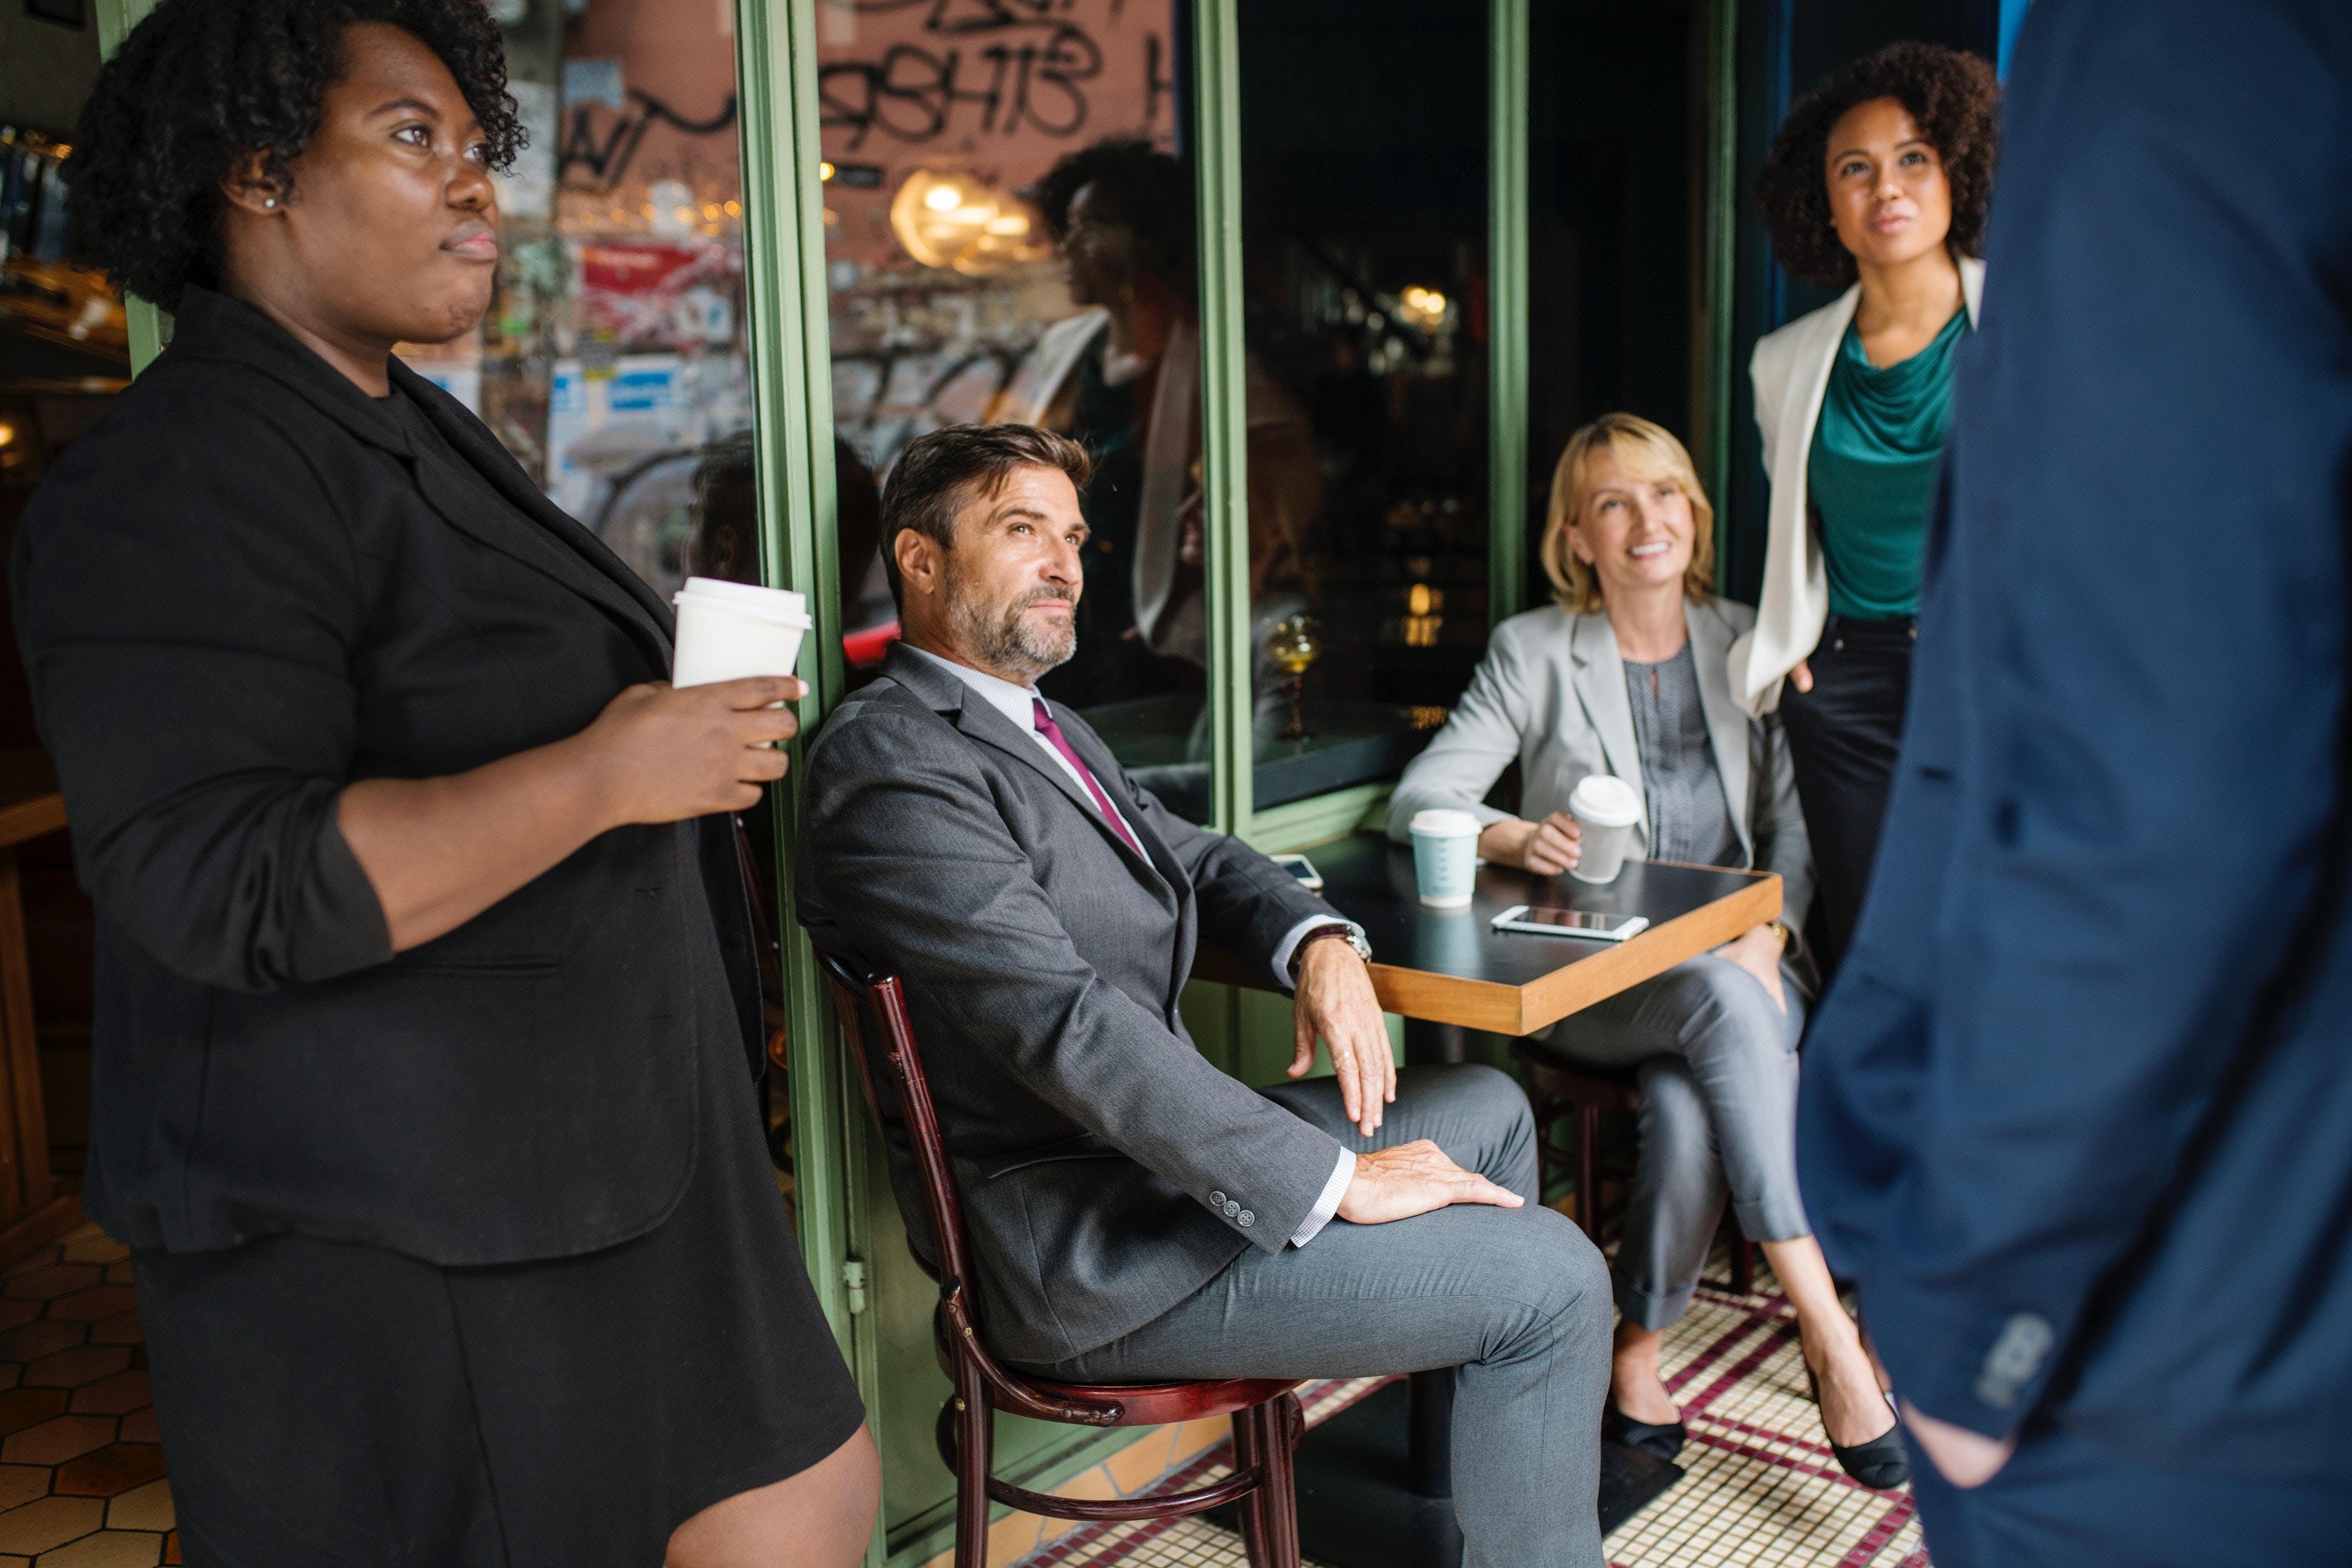 Art of Team Work in Nonprofits